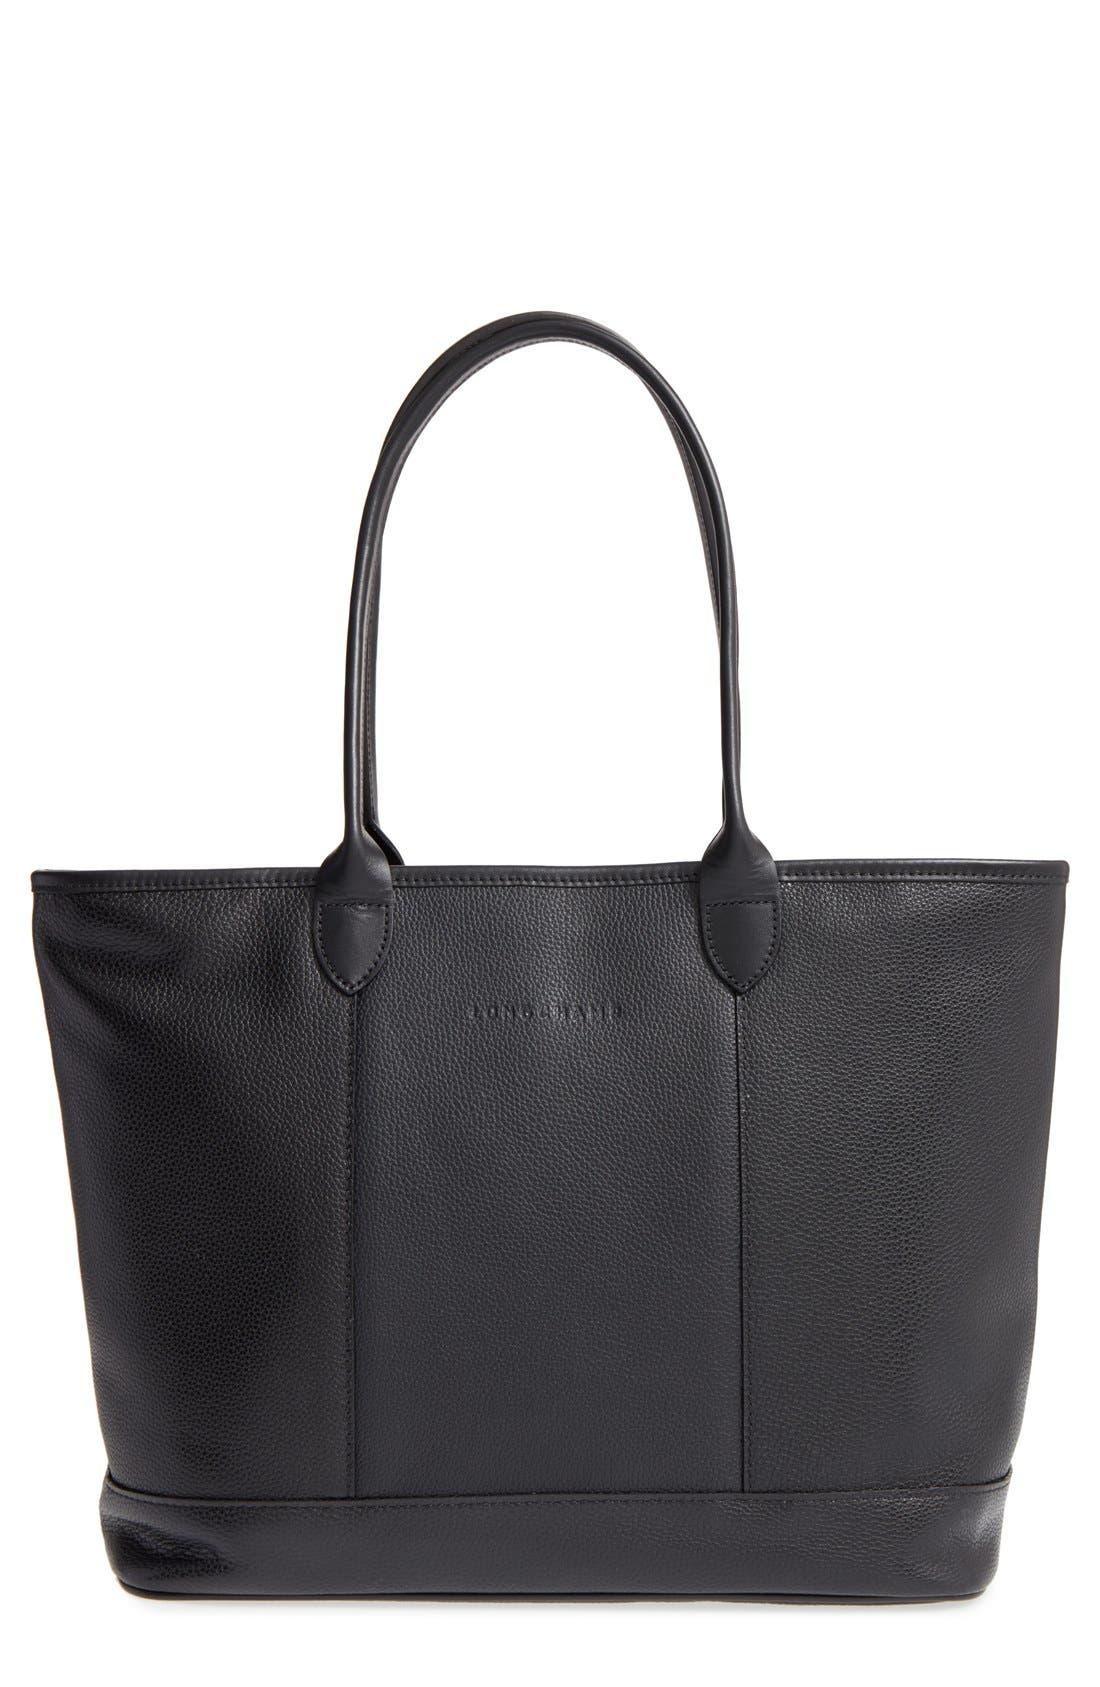 Alternate Image 1 Selected - Longchamp 'Veau' Leather Tote